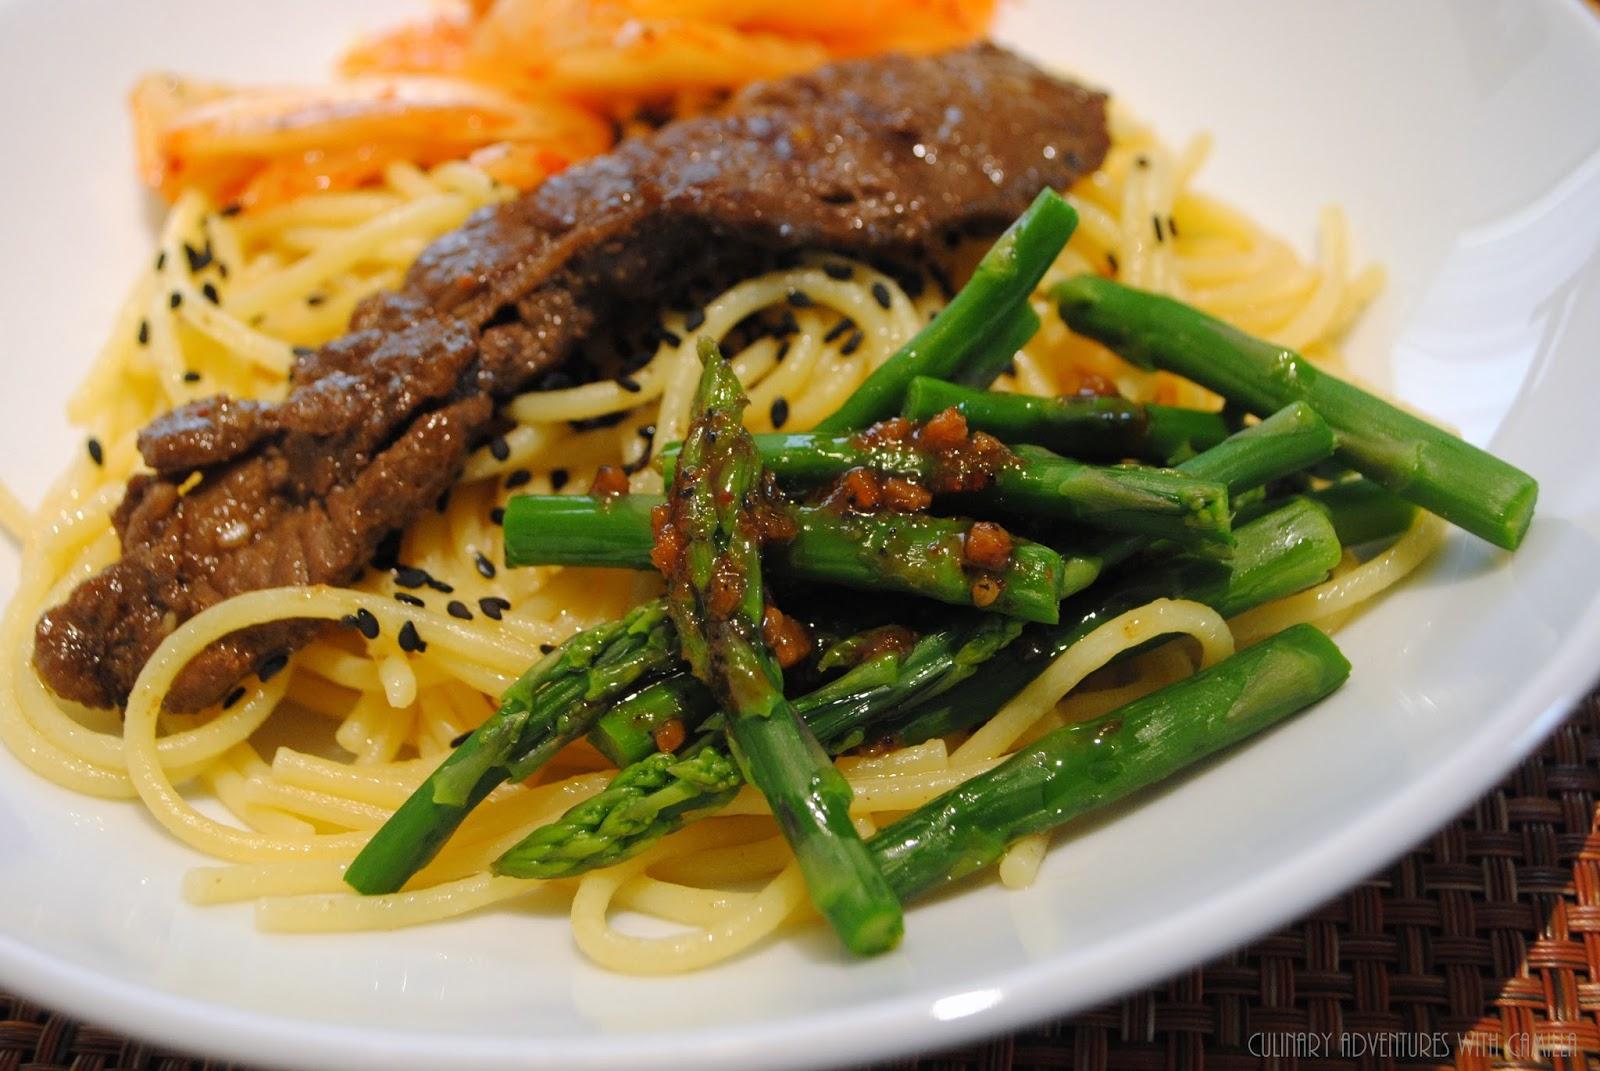 Asparagus in Korean - low calorie content